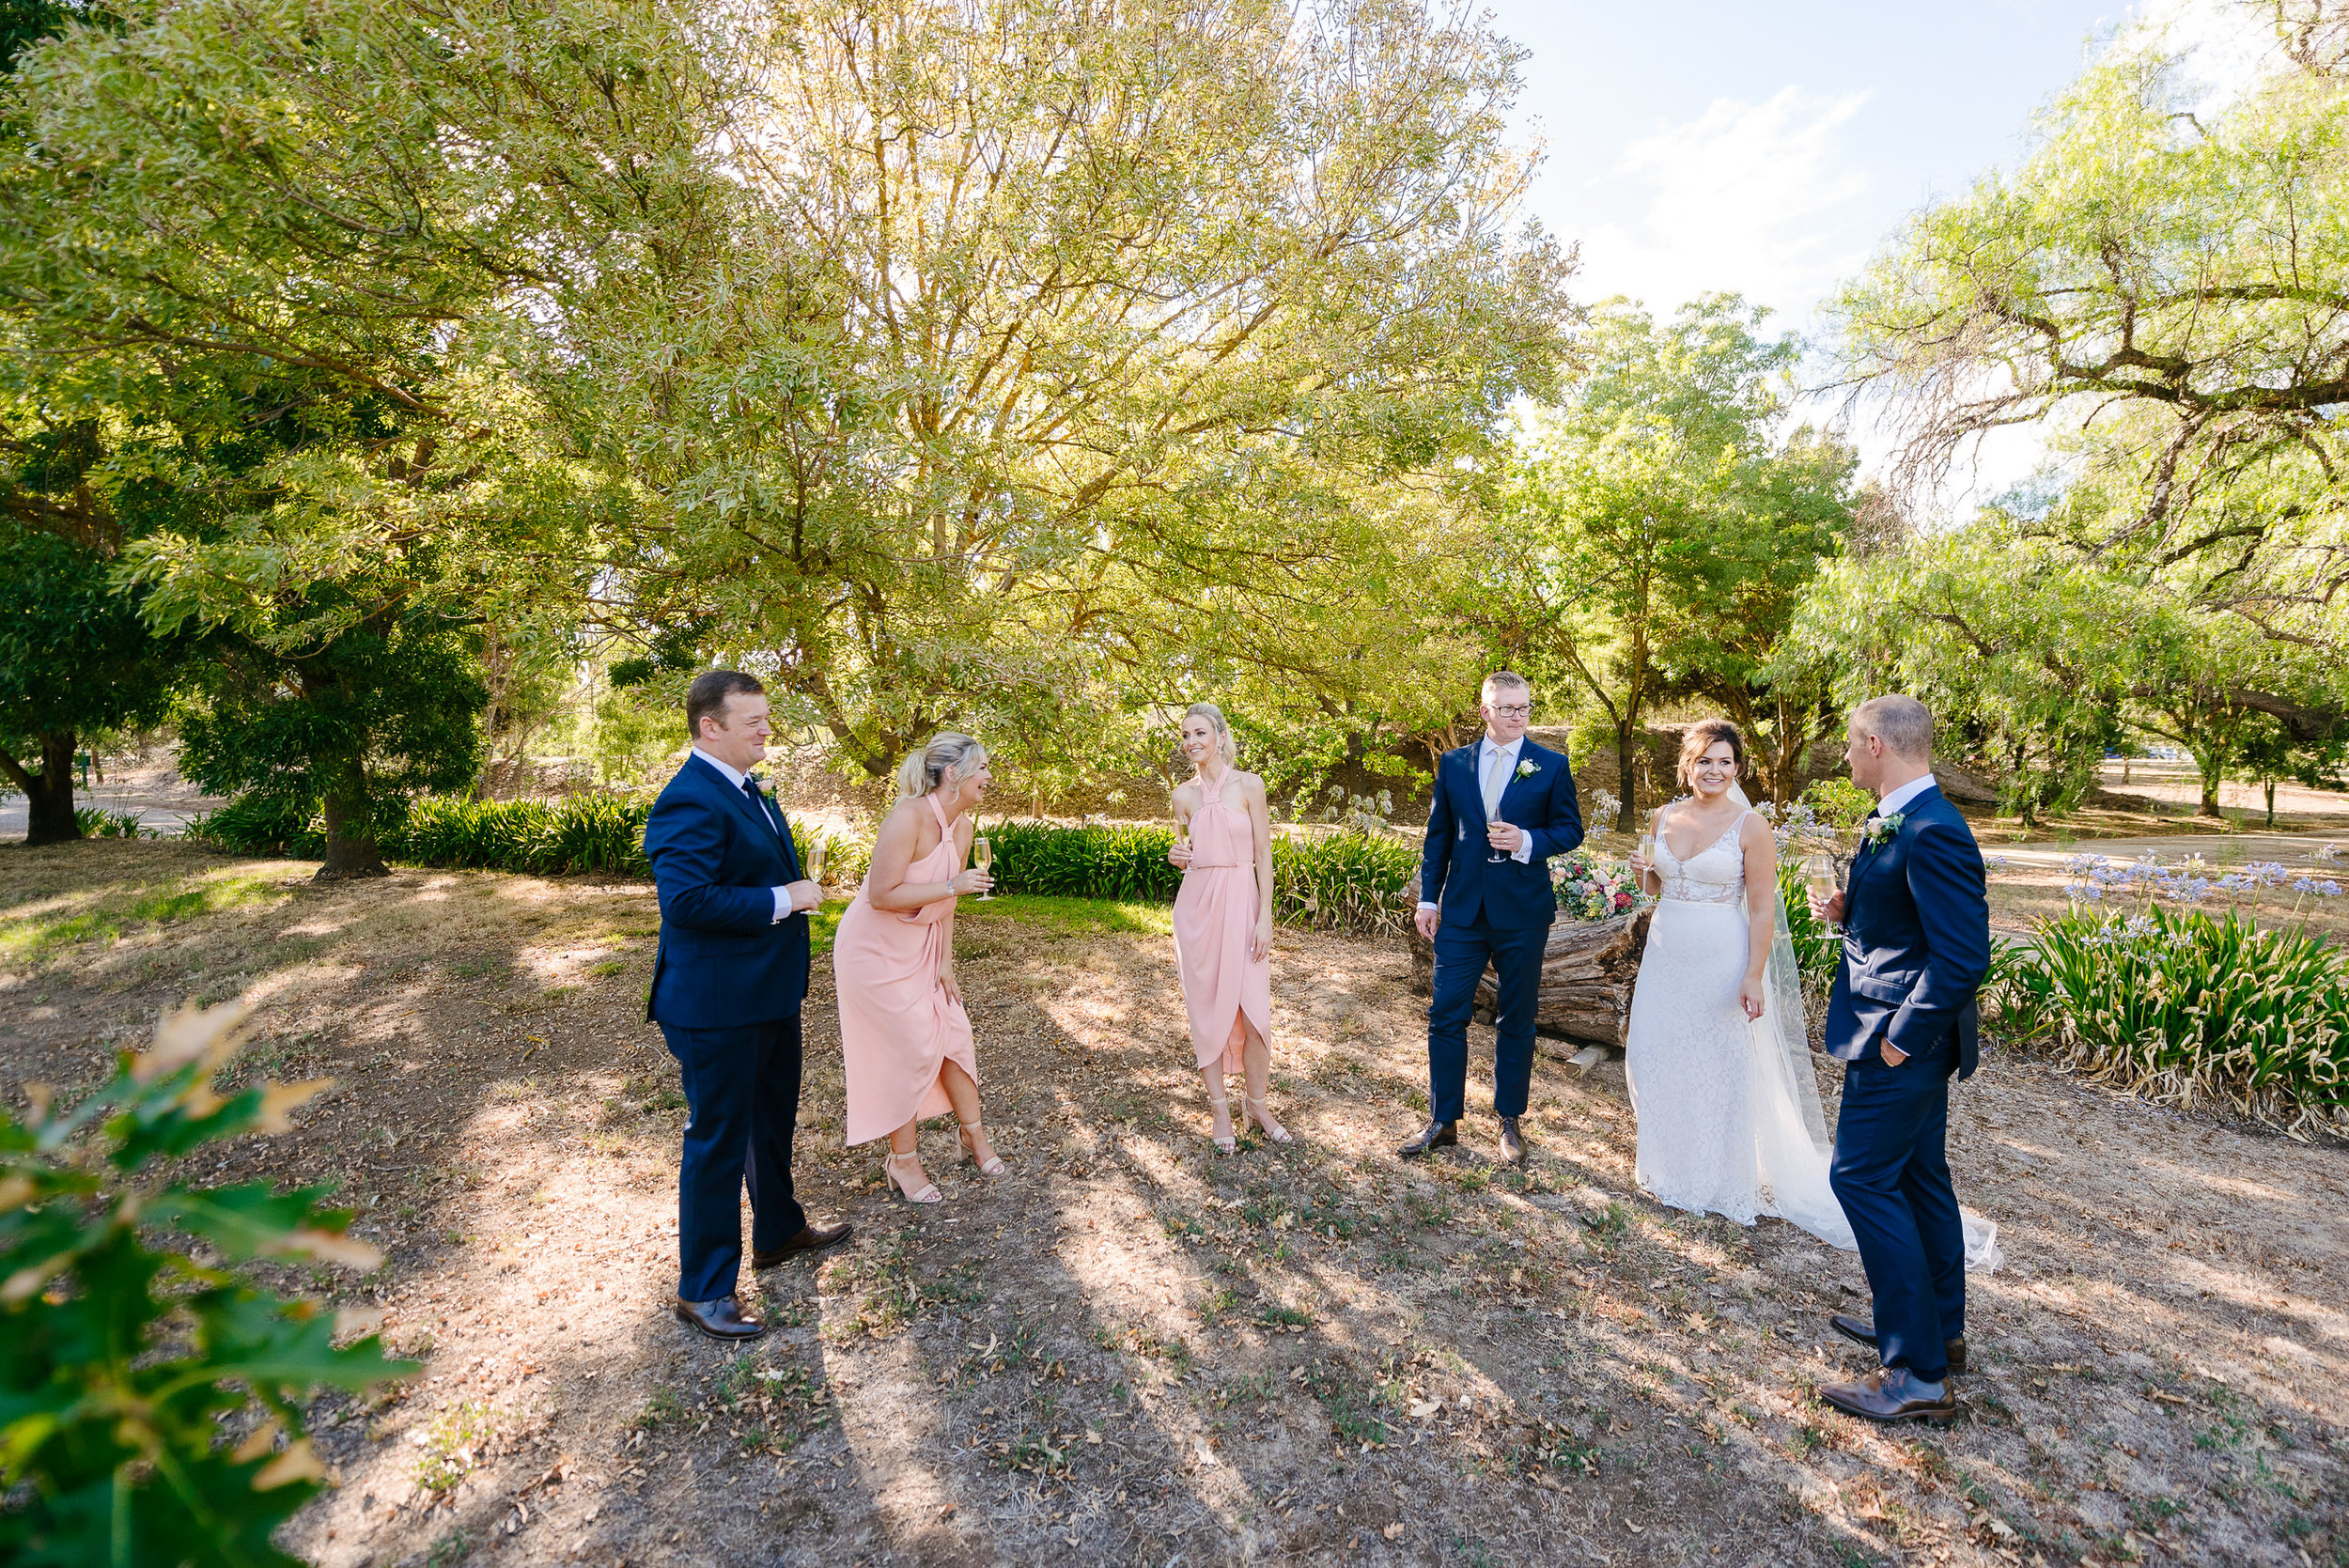 Justin_And_Jim_Photography_Chateau_Dore_Bendigo_Wedding51.JPG